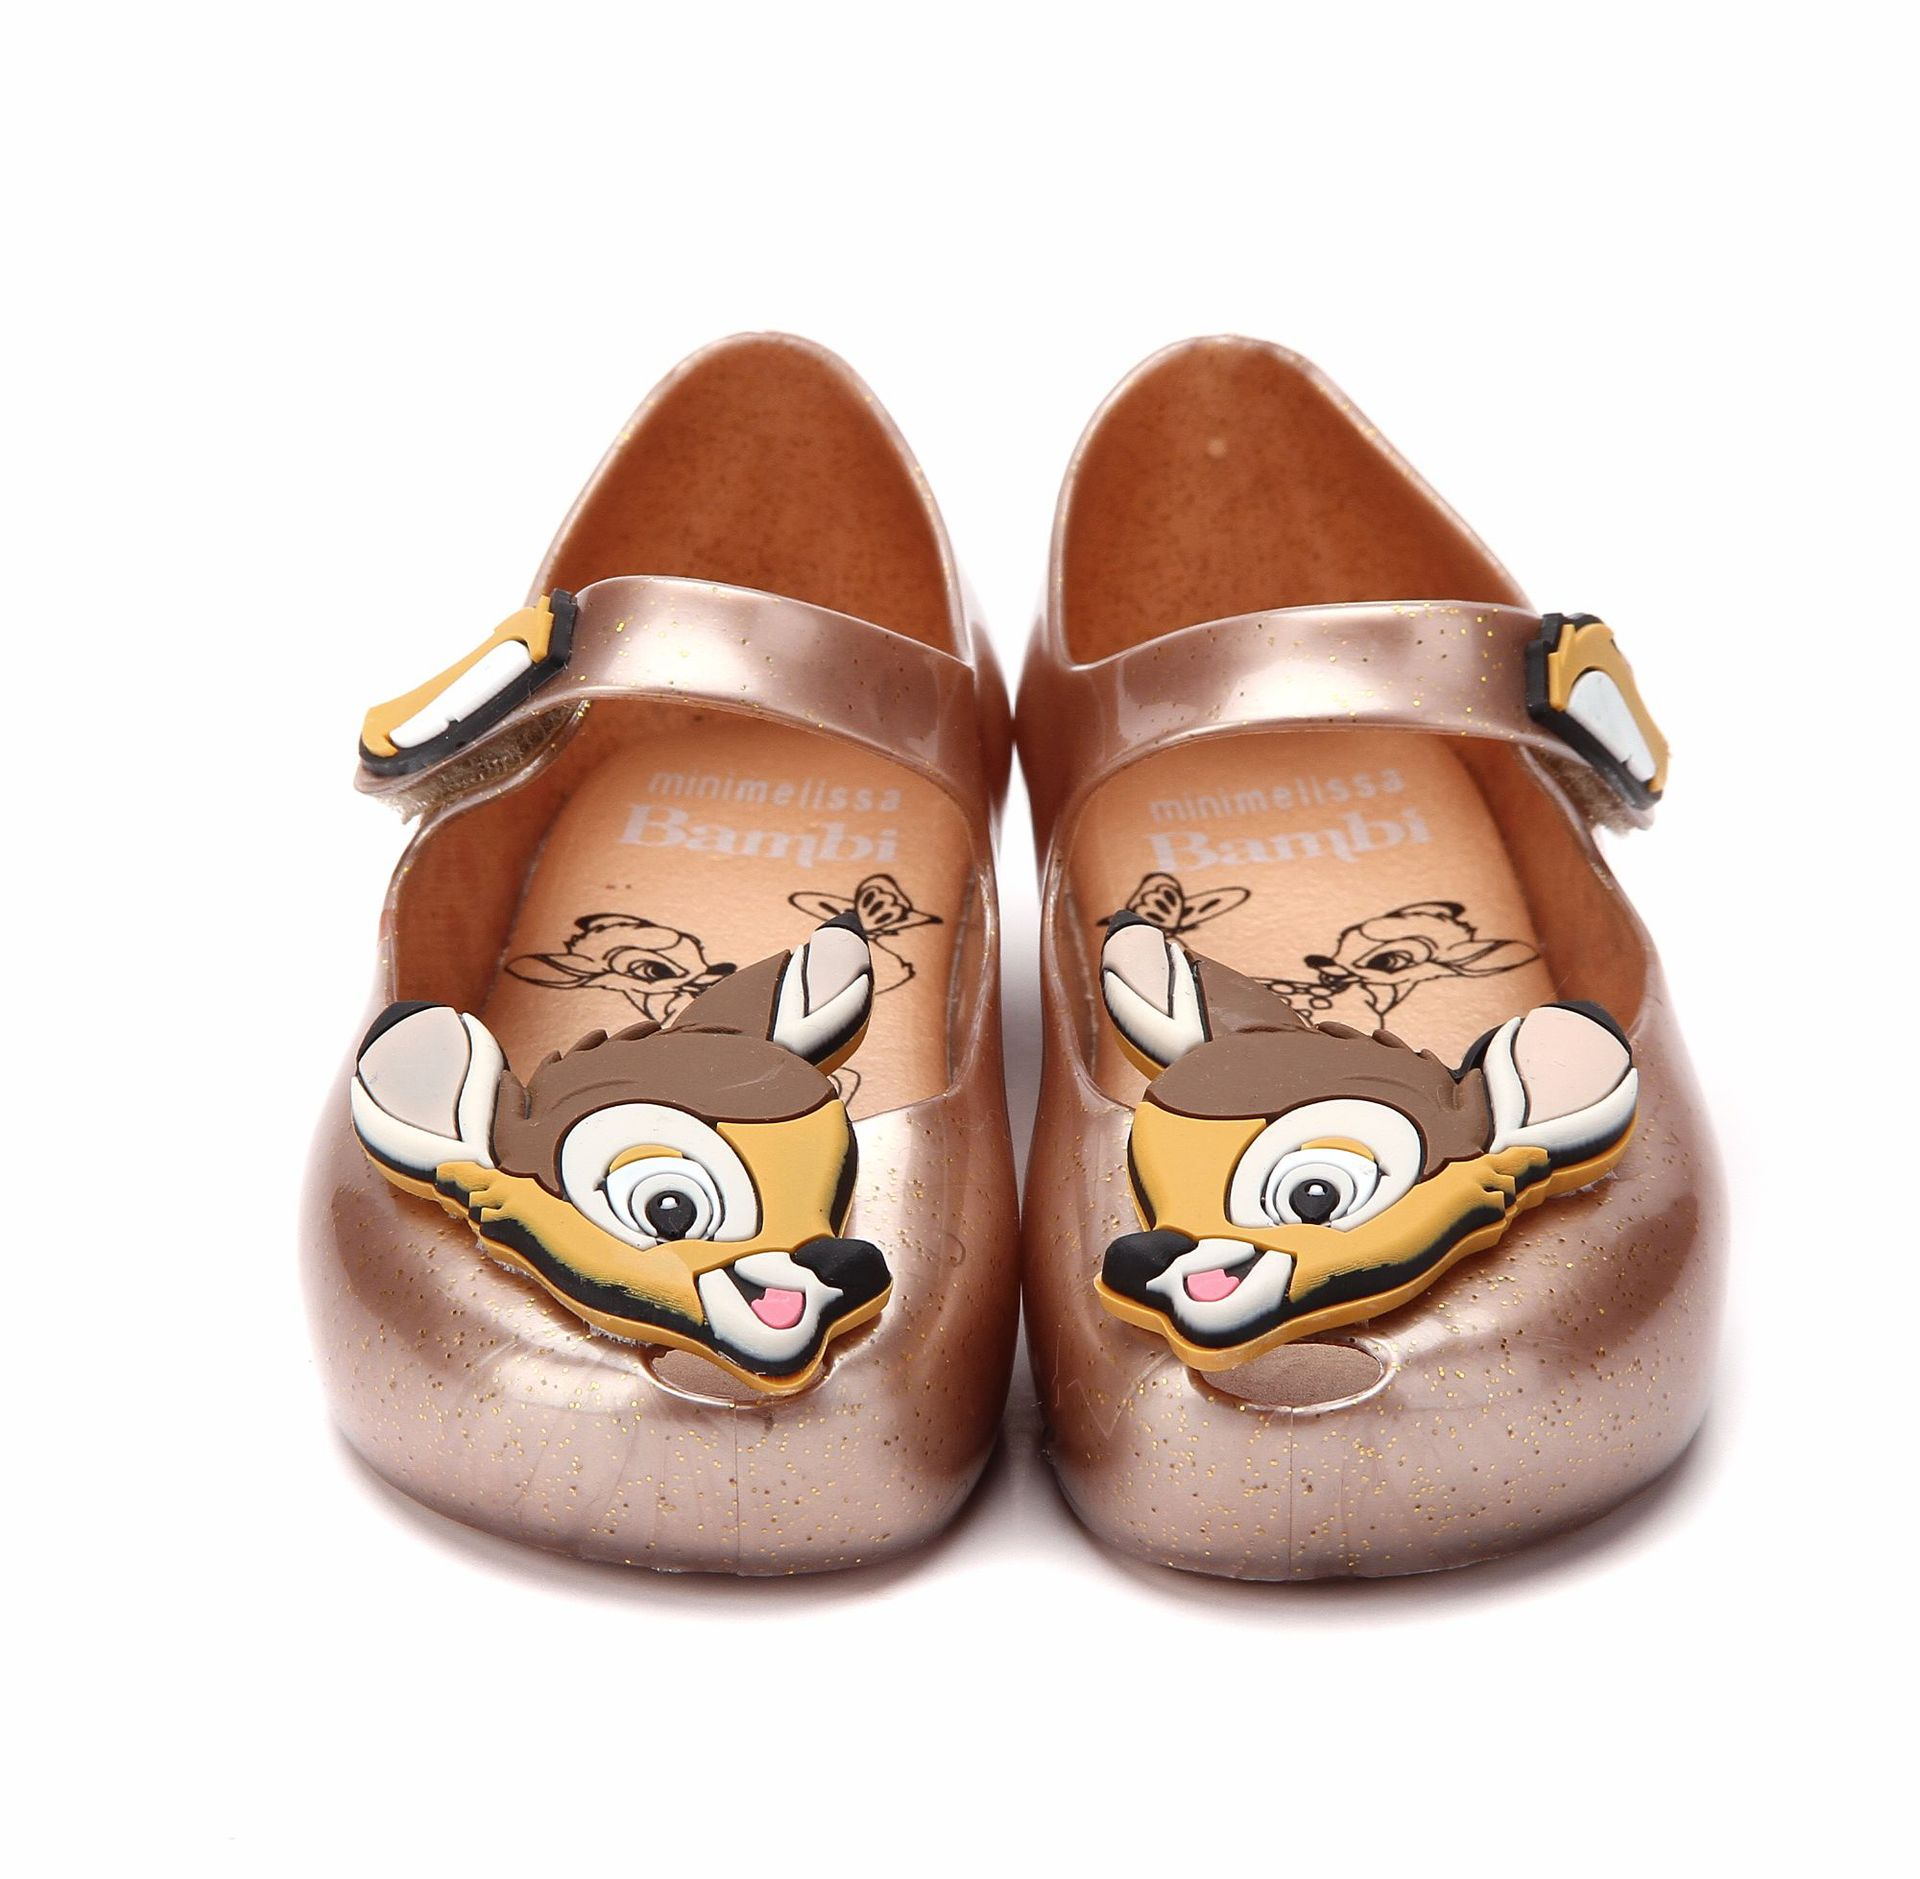 new Brazilian Mini Melissa Beauty Beast Jelly Sandals Tea Teapot Children Shoes Sandals kids Beauty Beast Sandals 13-18cm